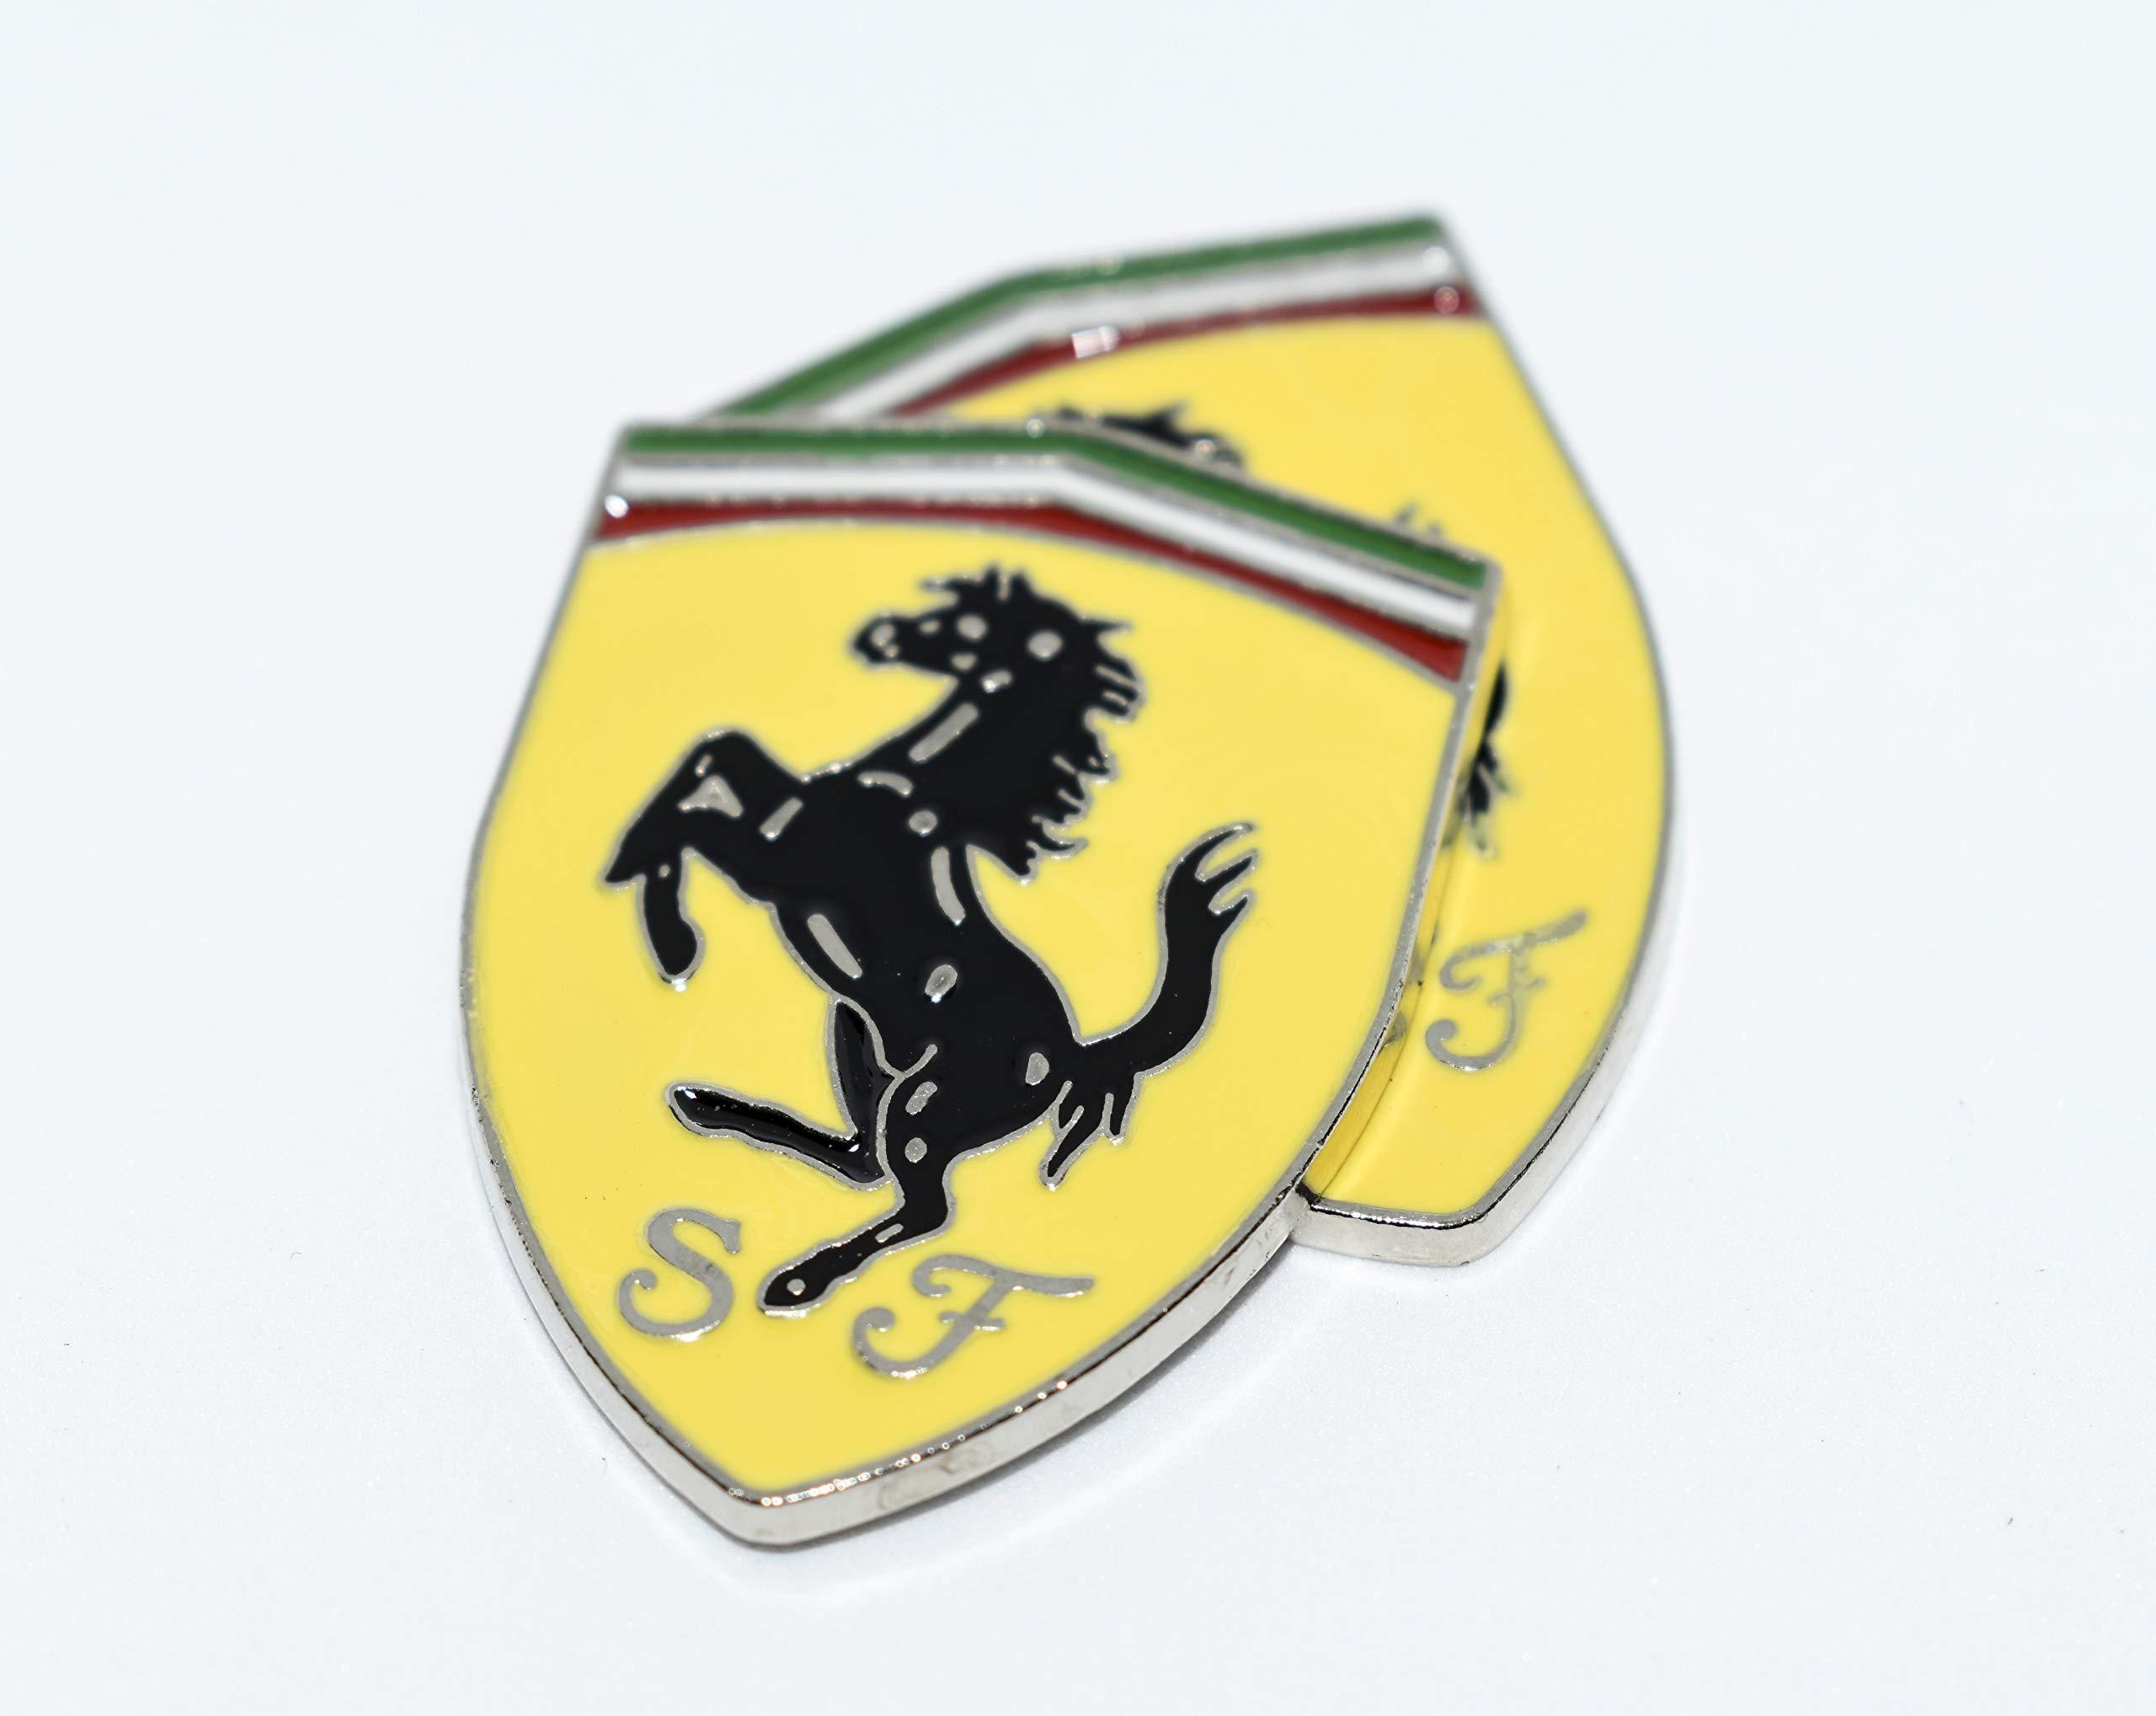 Incognito 7 Metal 3d Ferrari Logo Car Bike Sticker 8 X 6 Cm Bronze Buy Online In Faroe Islands At Faroe Desertcart Com Productid 92205529